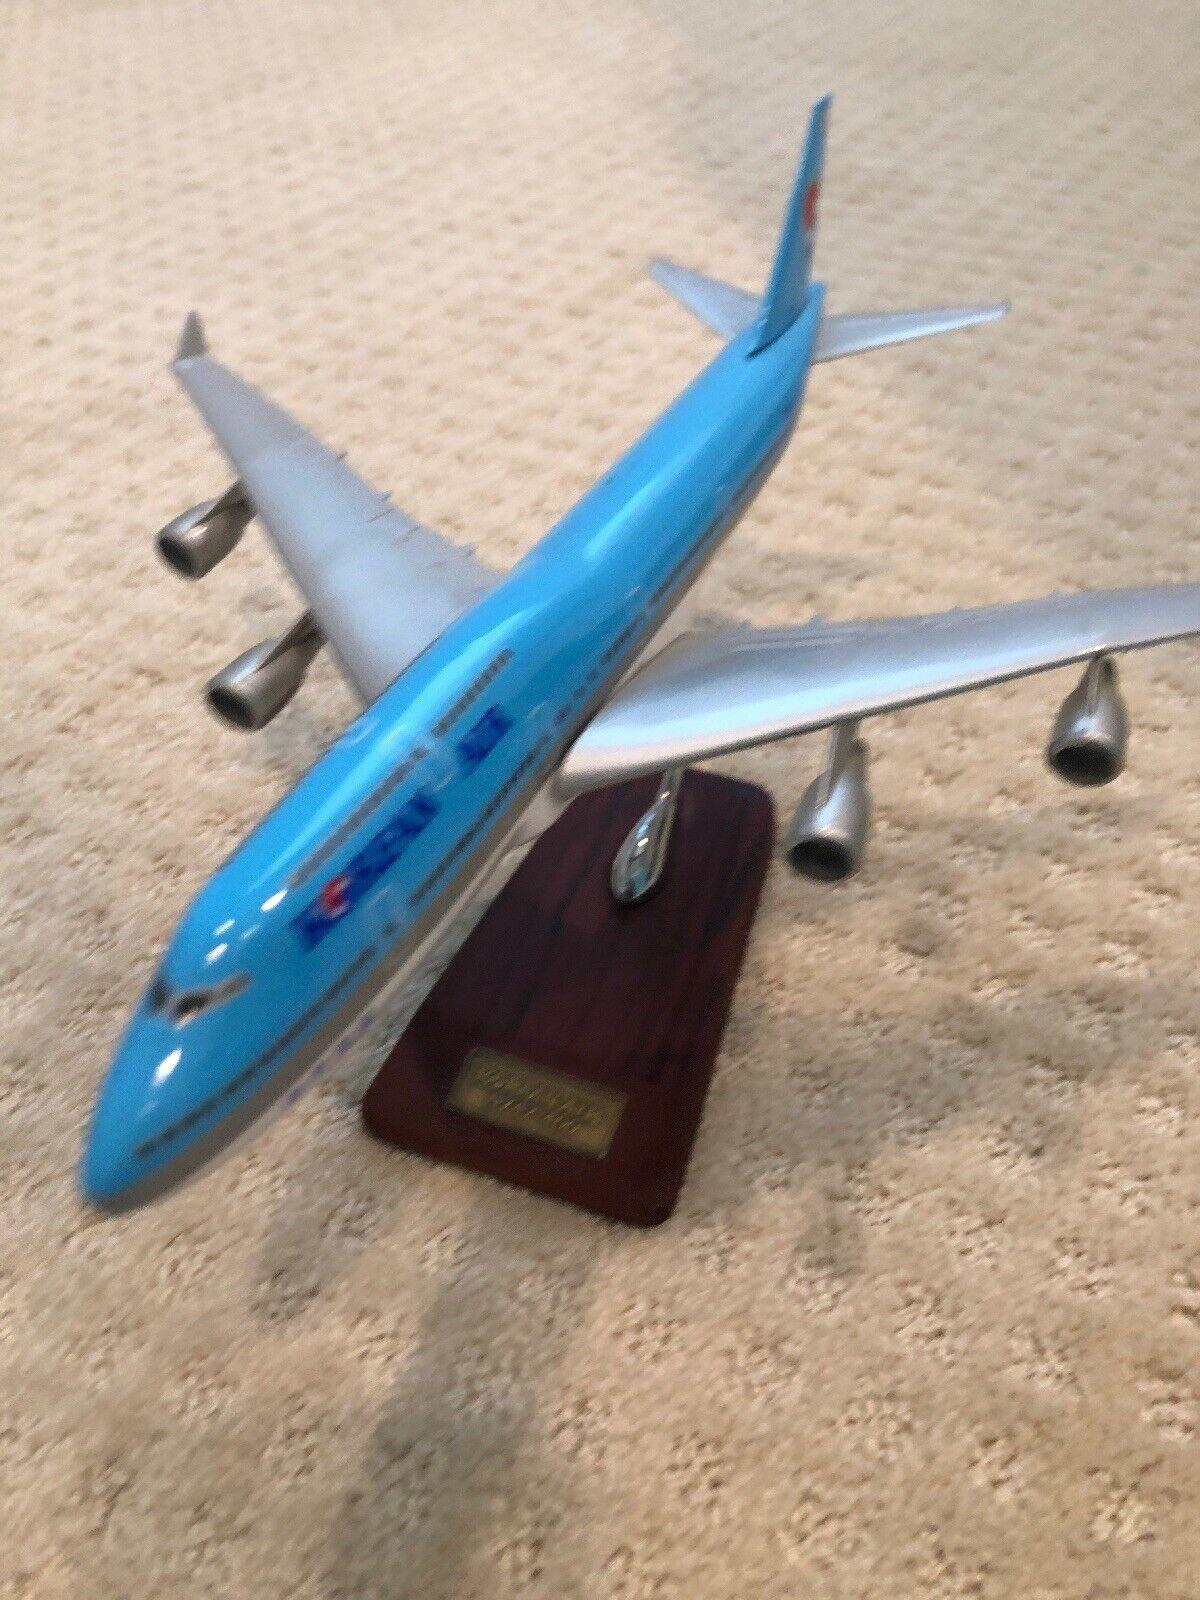 Korean Air Boeing 747-400 pasajero avión avioneta Modelo Diecast